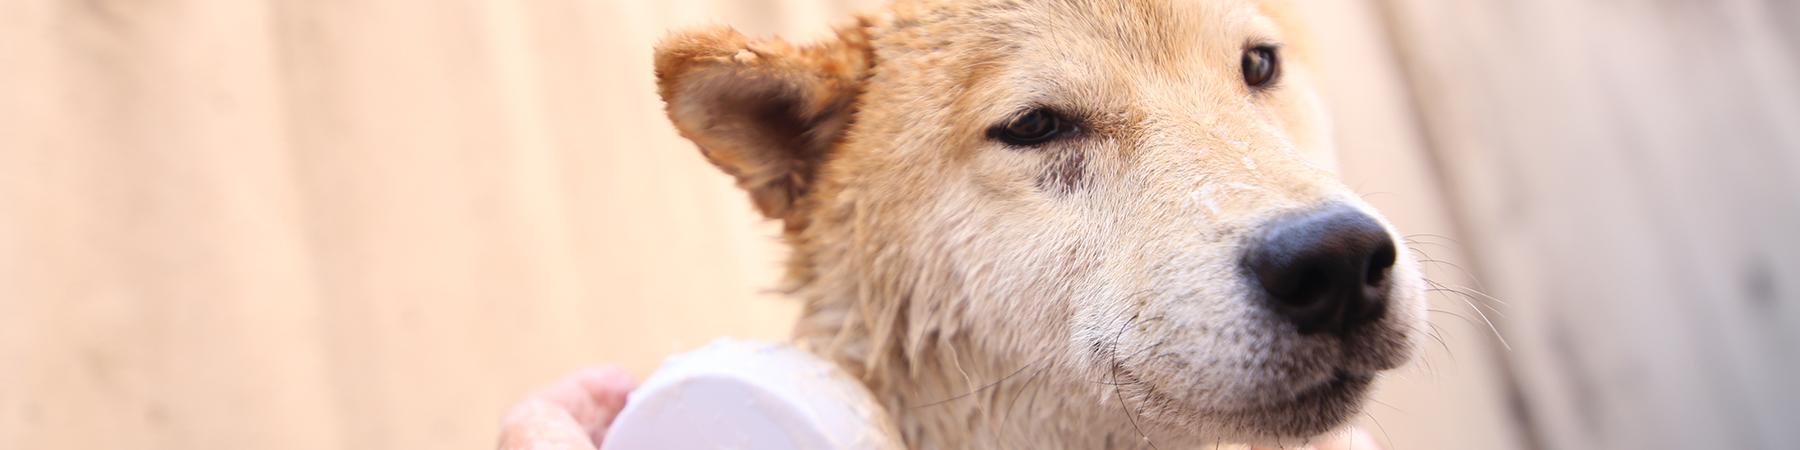 日本生活環境支援協会 | 犬猫介護アドバイザー認定試験